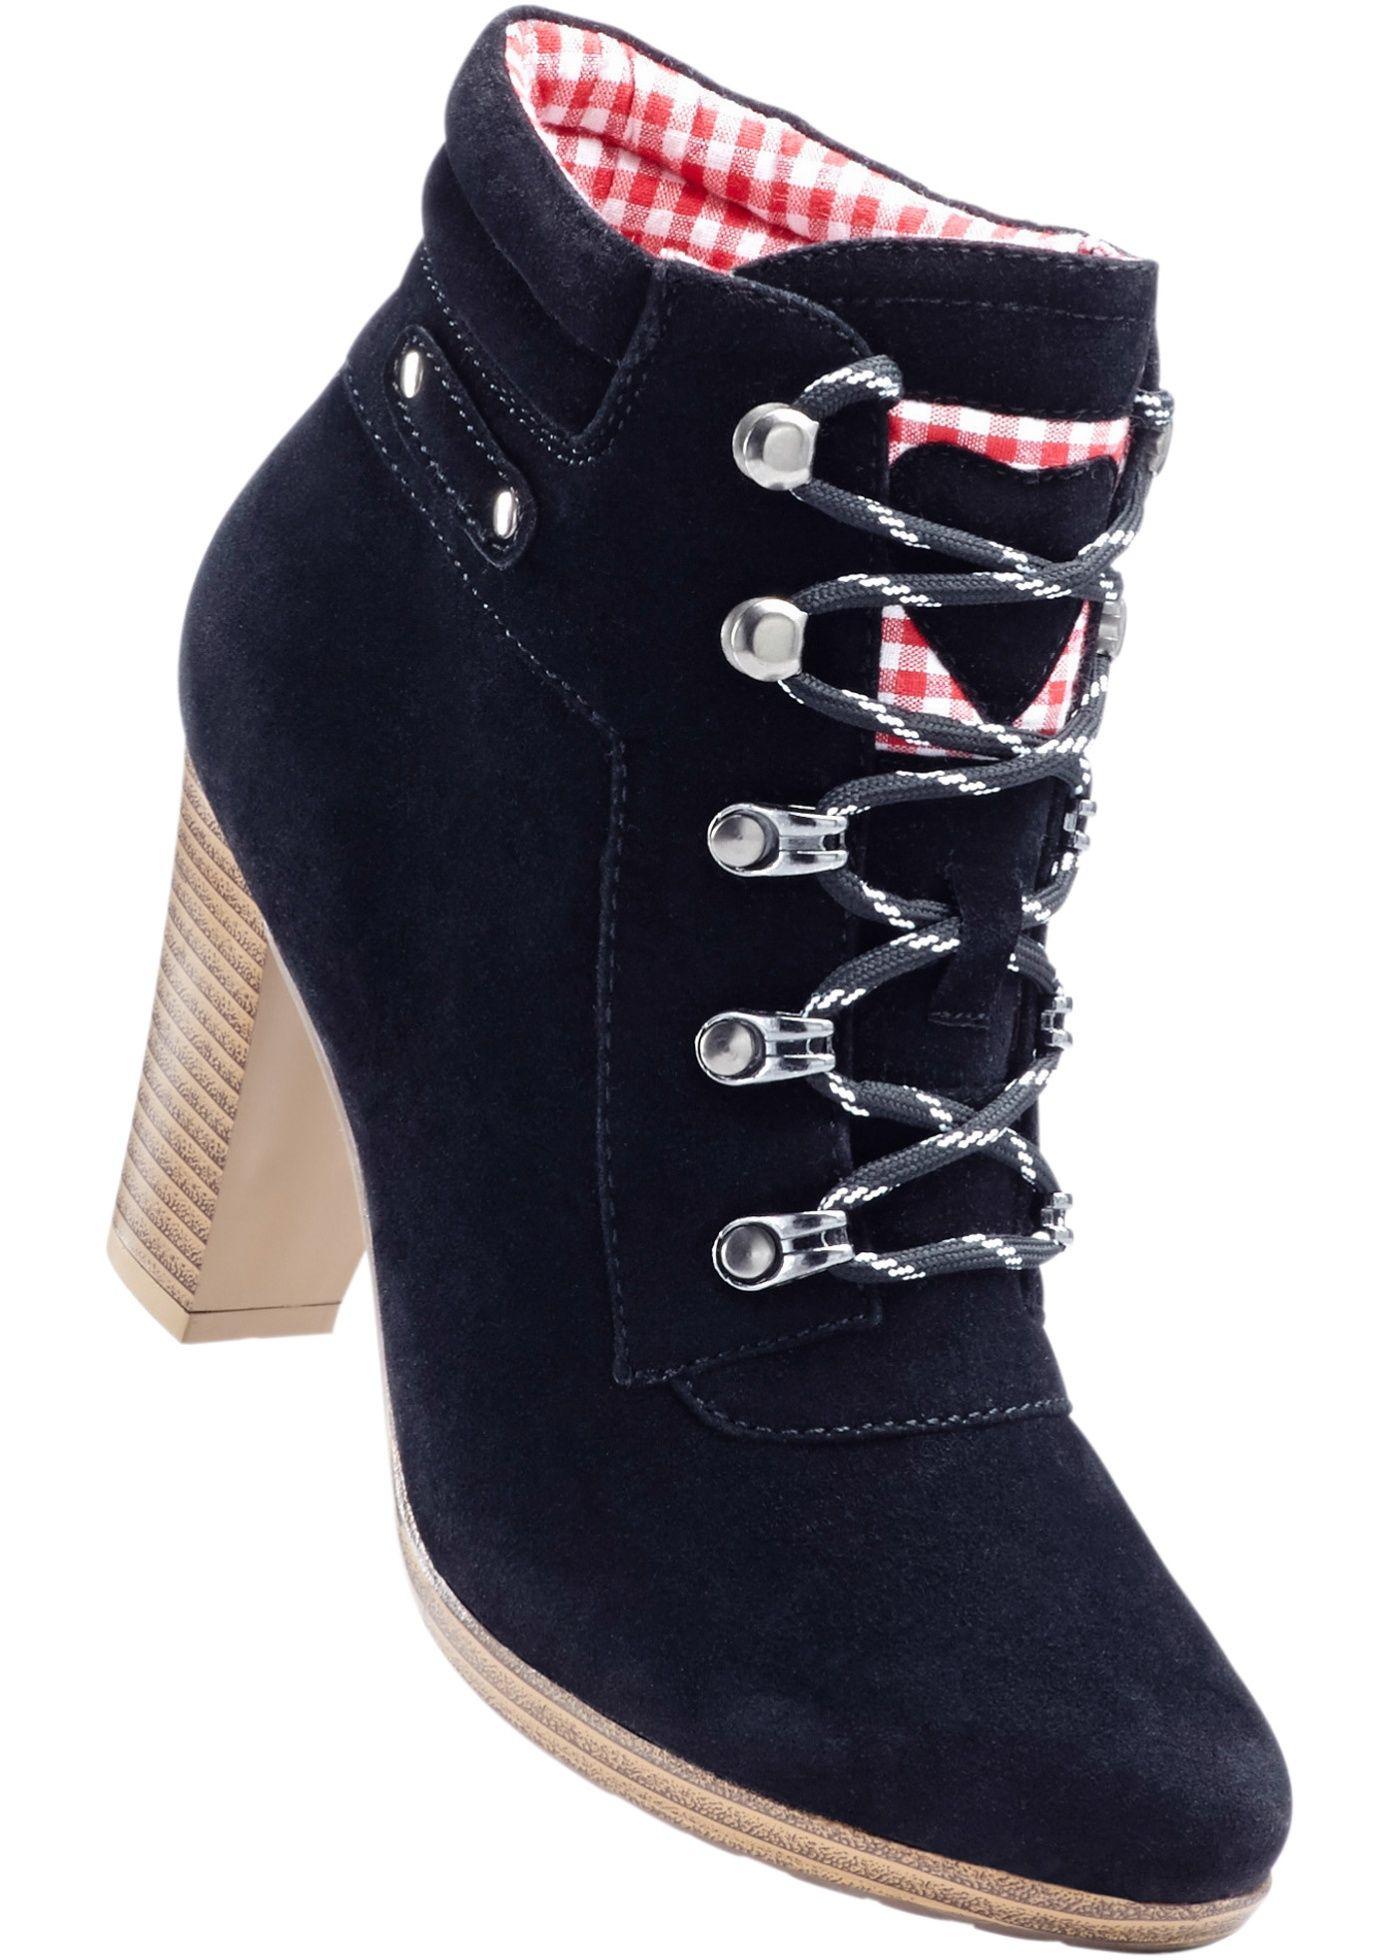 brand new 35a16 a5788 Pin auf * Shoe Slut *